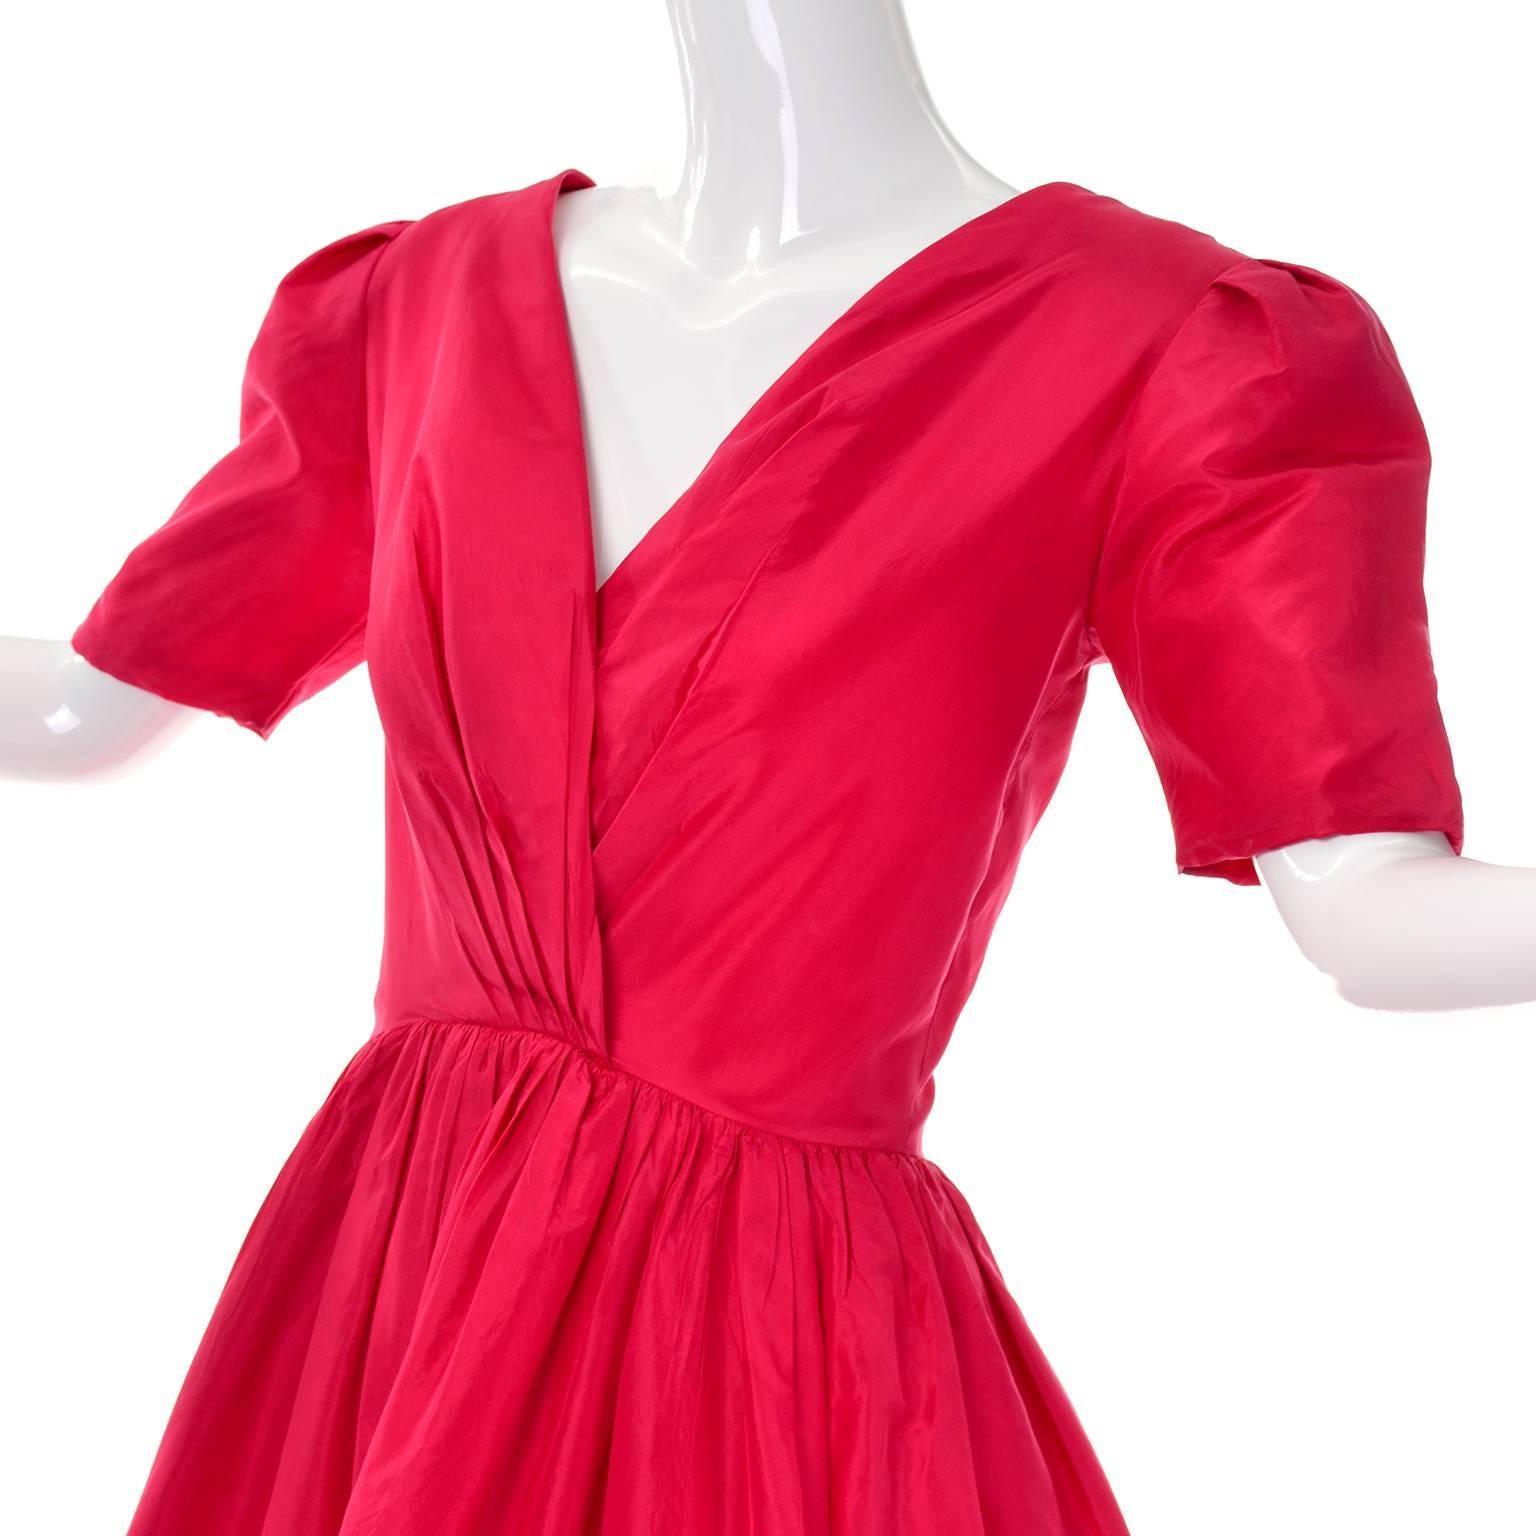 fcd7f0882f Oscar de la Renta Vintage Red Silk Party Dress from Bonwit Teller in Size  4 6 For Sale at 1stdibs